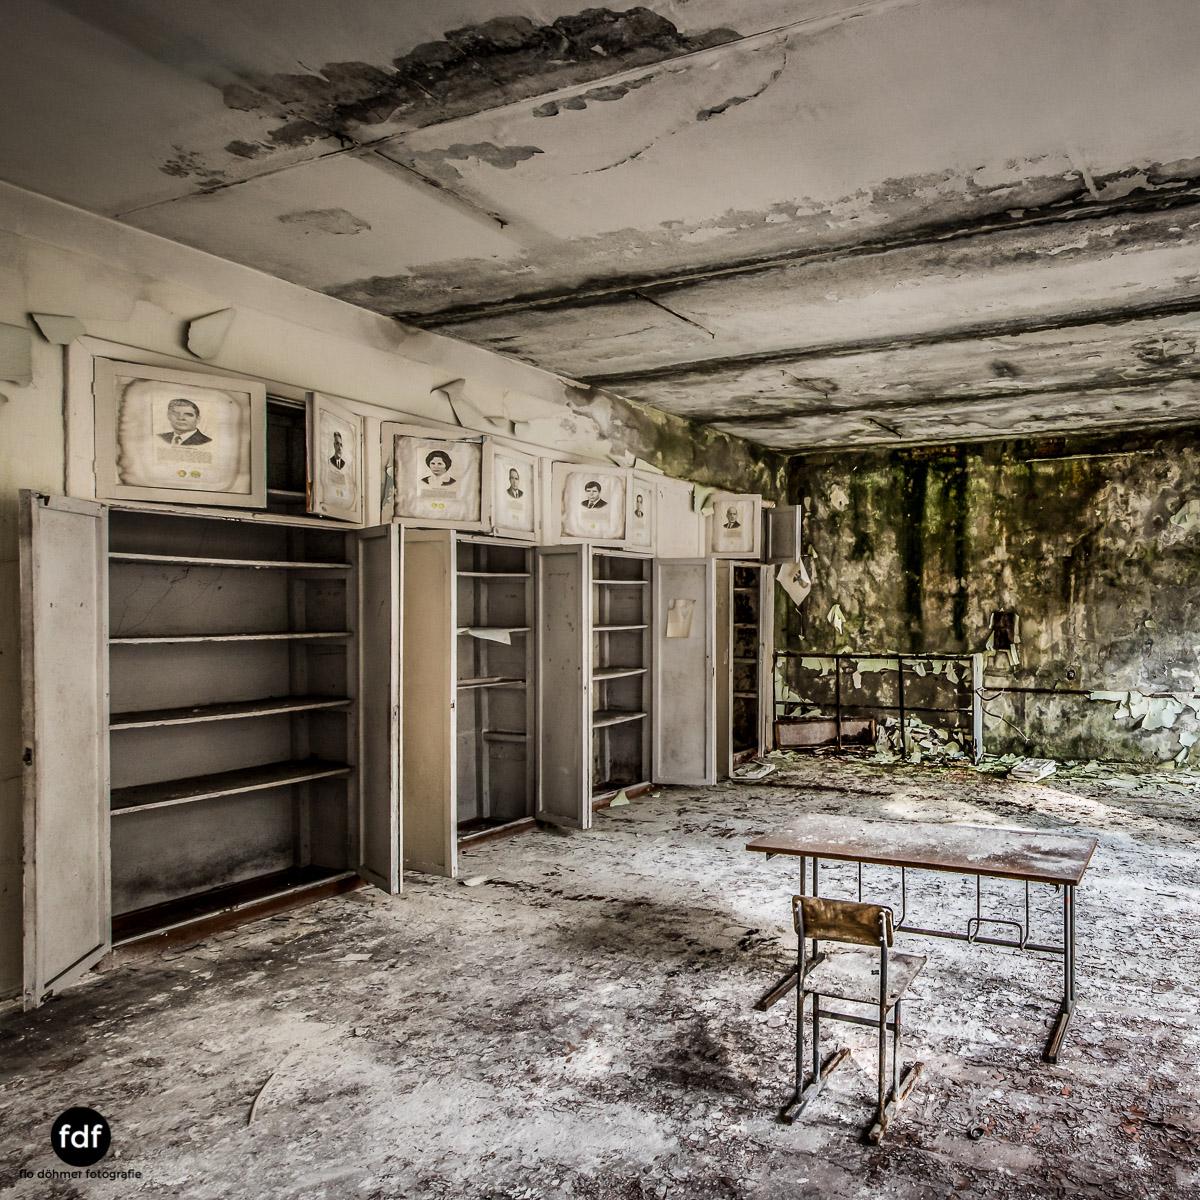 Tschernobyl-Chernobyl-Prypjat-Urbex-Lost-Place-Duga-Schule-Kino-20.jpg